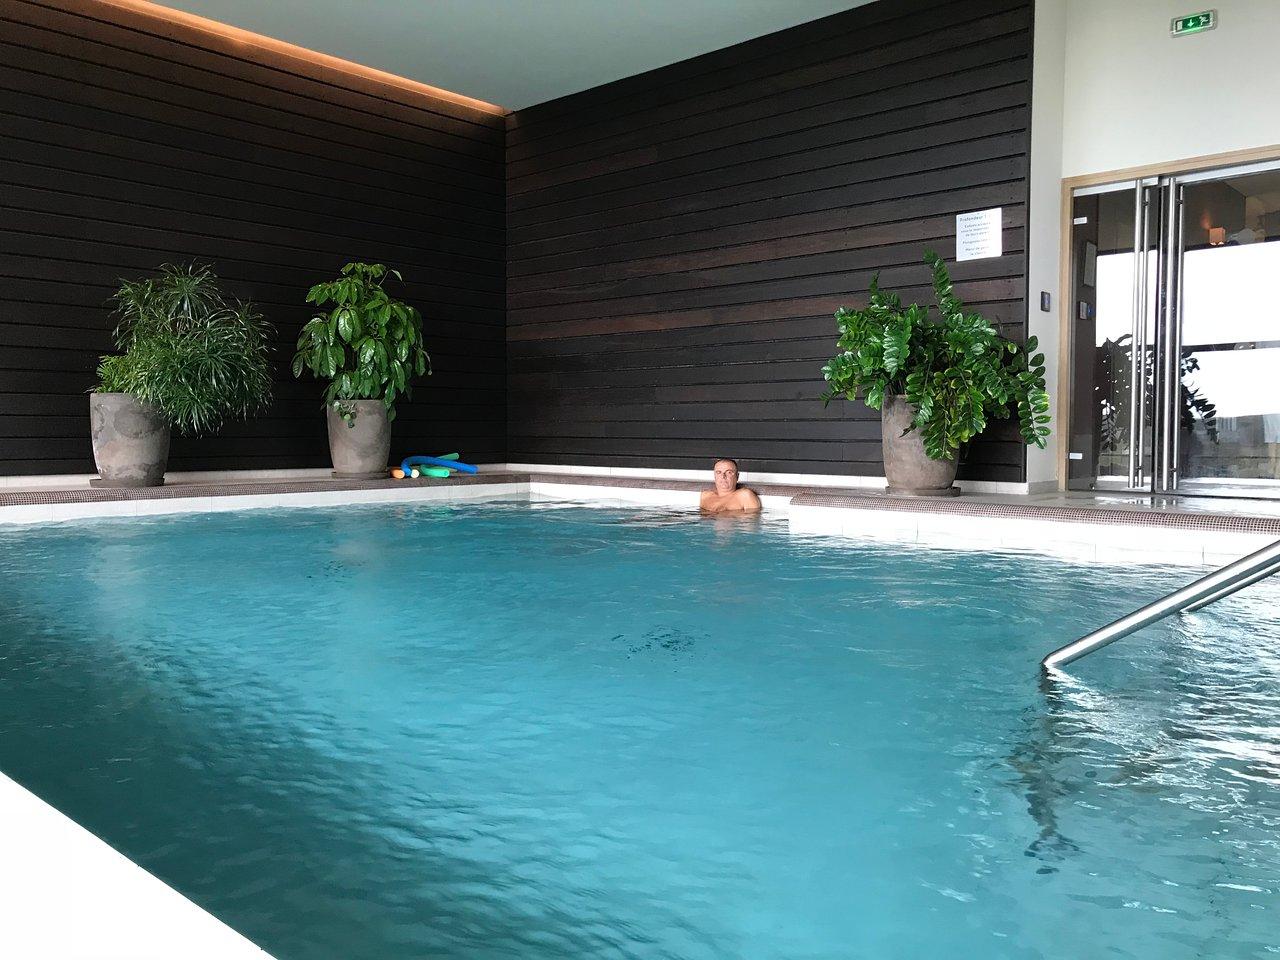 La Gree Des Landes Eco Hotel Spa Yves Rocher Pool Pictures ... dedans Piscine Malestroit